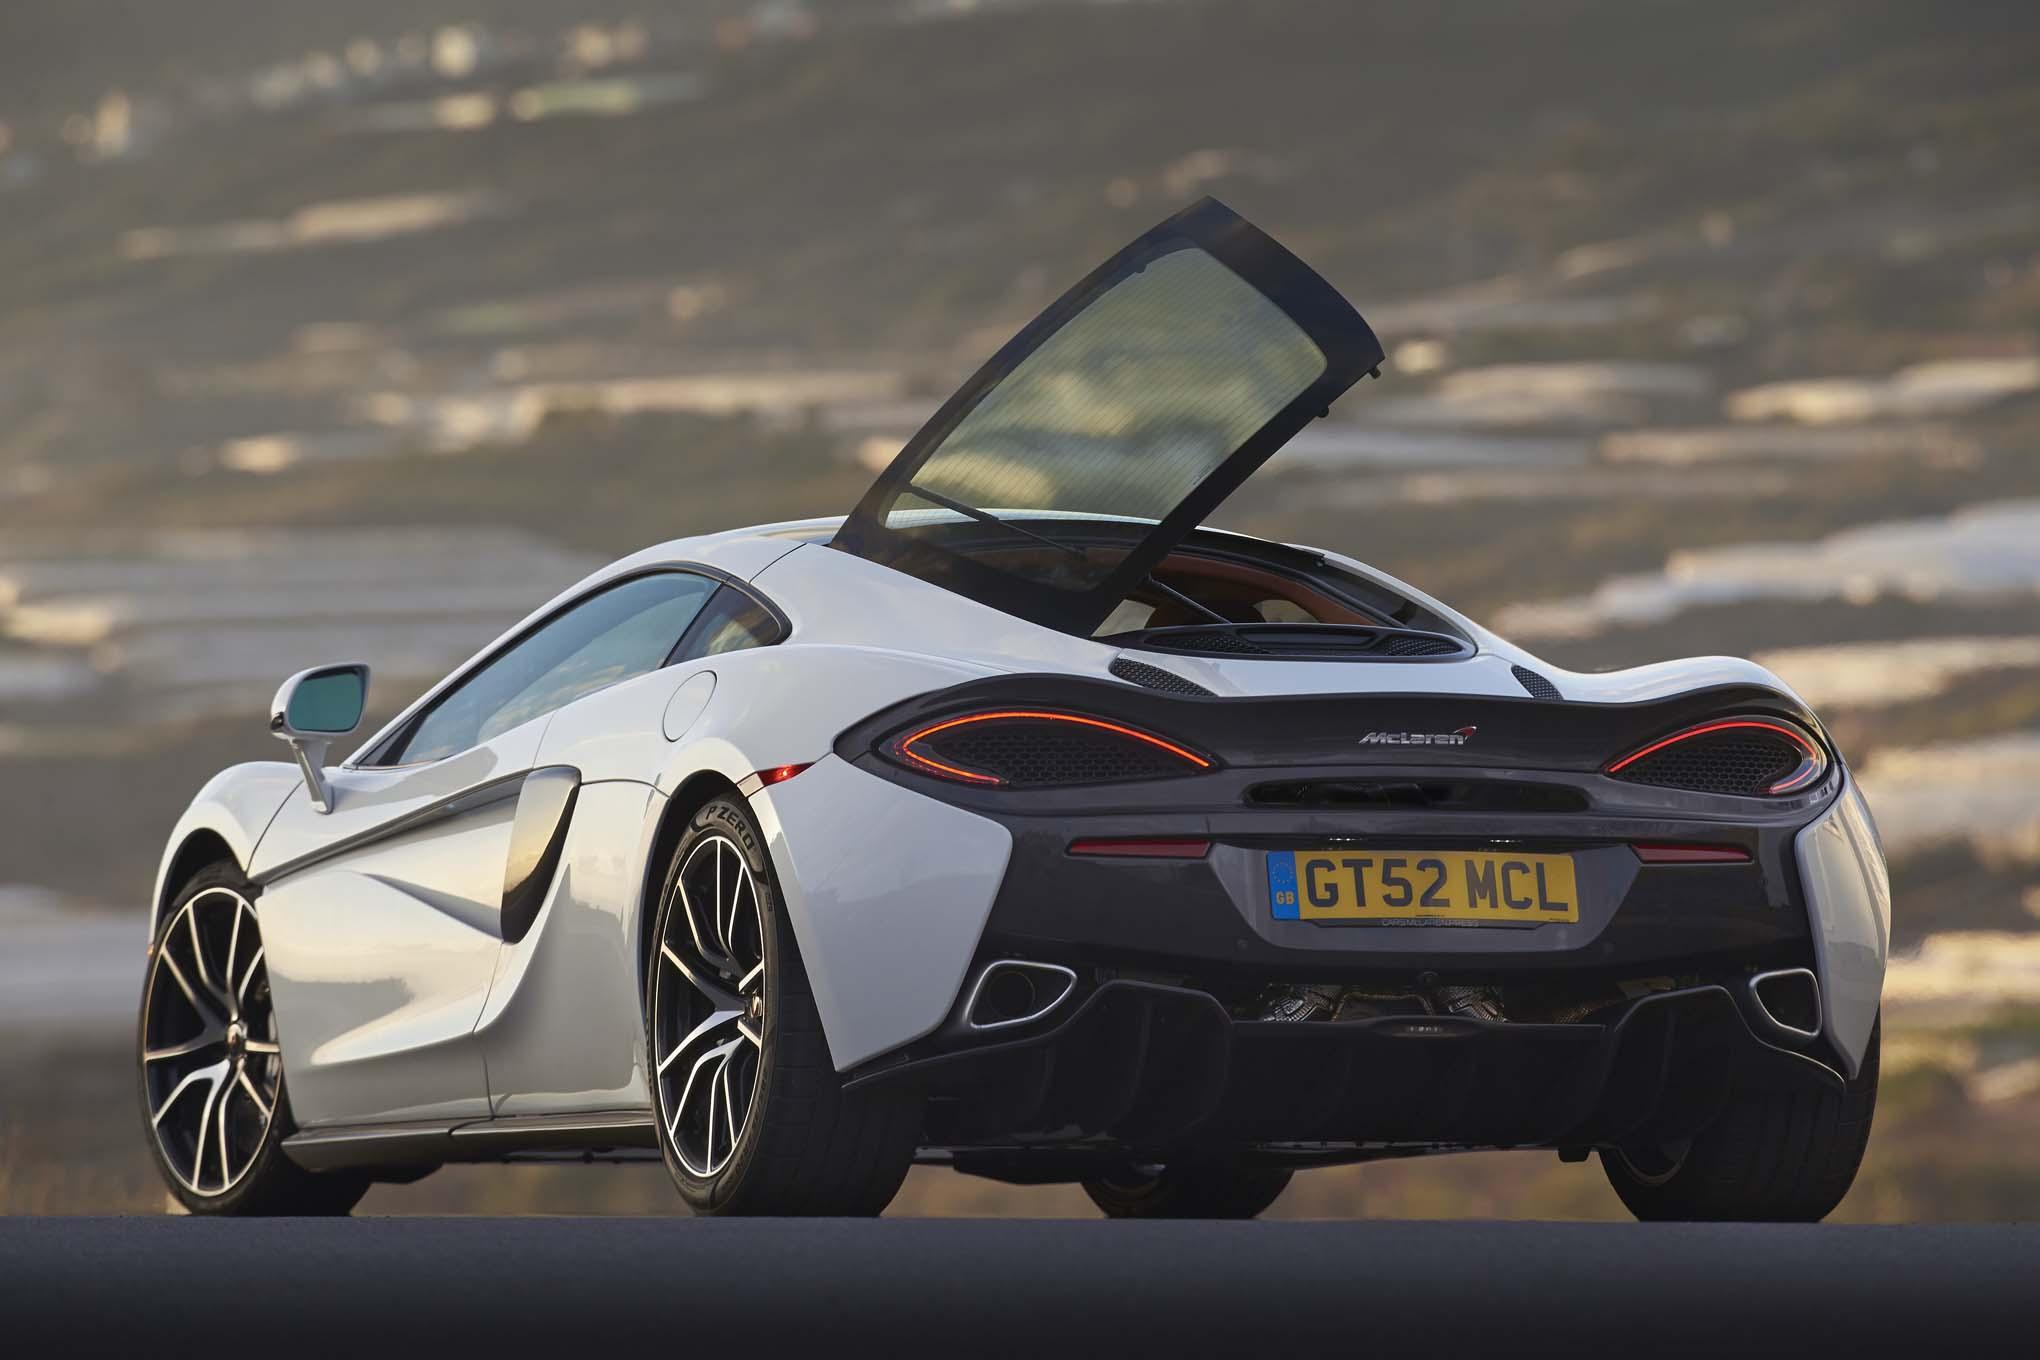 http://st.automobilemag.com/uploads/sites/11/2016/05/2017-McLaren-570GT-rear-three-quarters-03.jpg